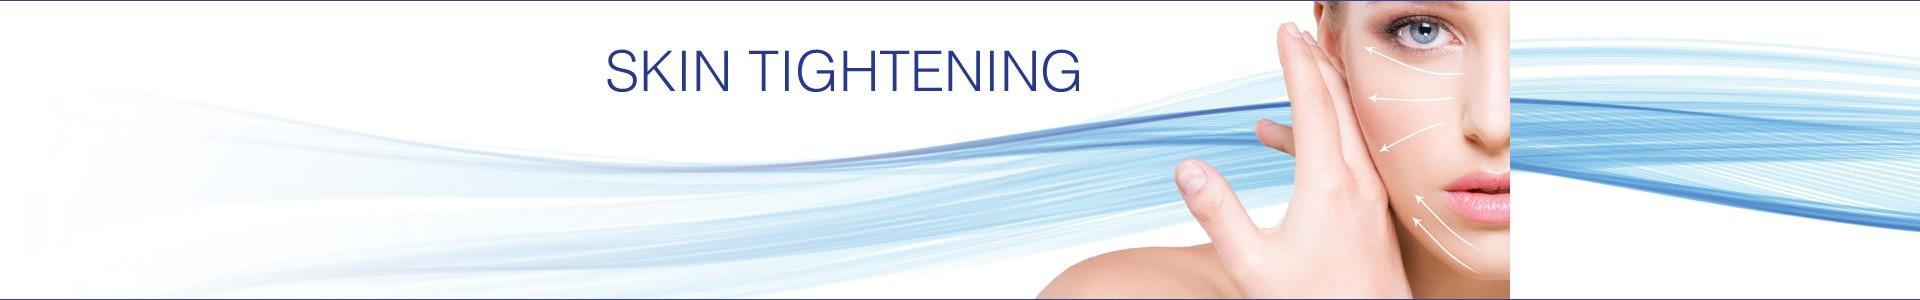 Skin Tightening - Smooth Skin Health Centre Hamilton